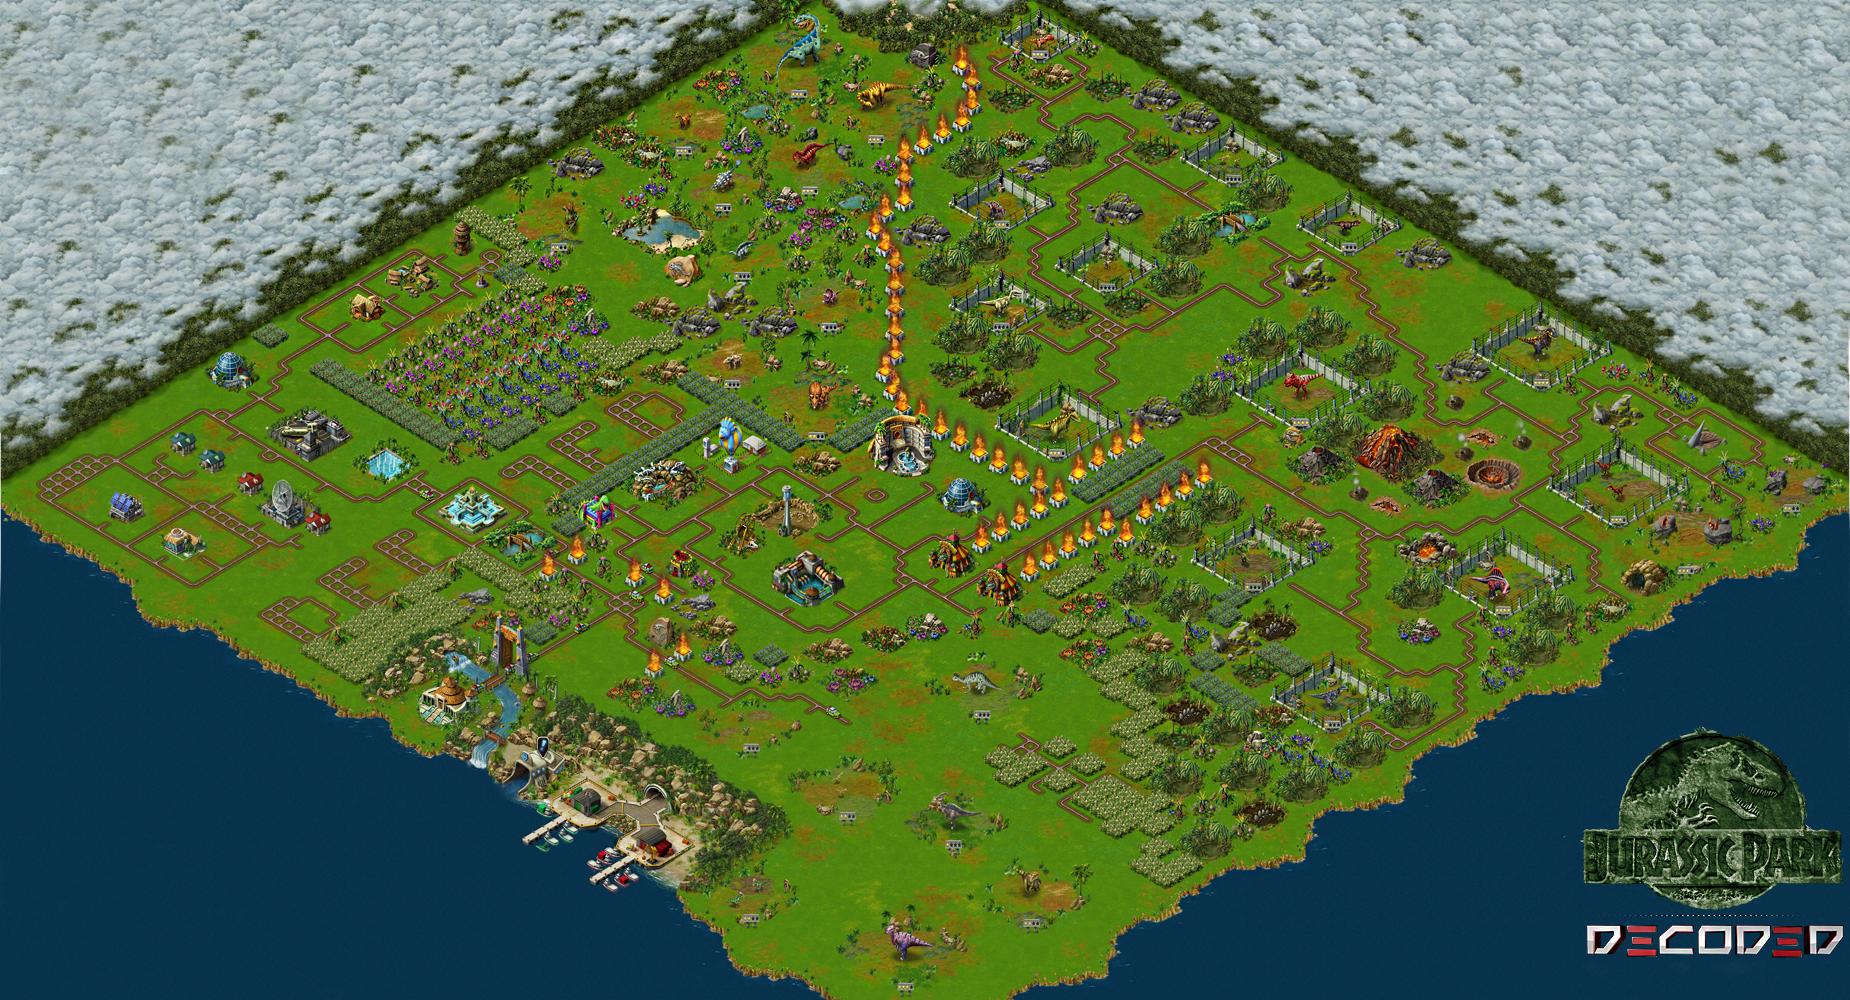 Jurassic park builder full map by iresarts on deviantart - Jurassic park builder decorations ...